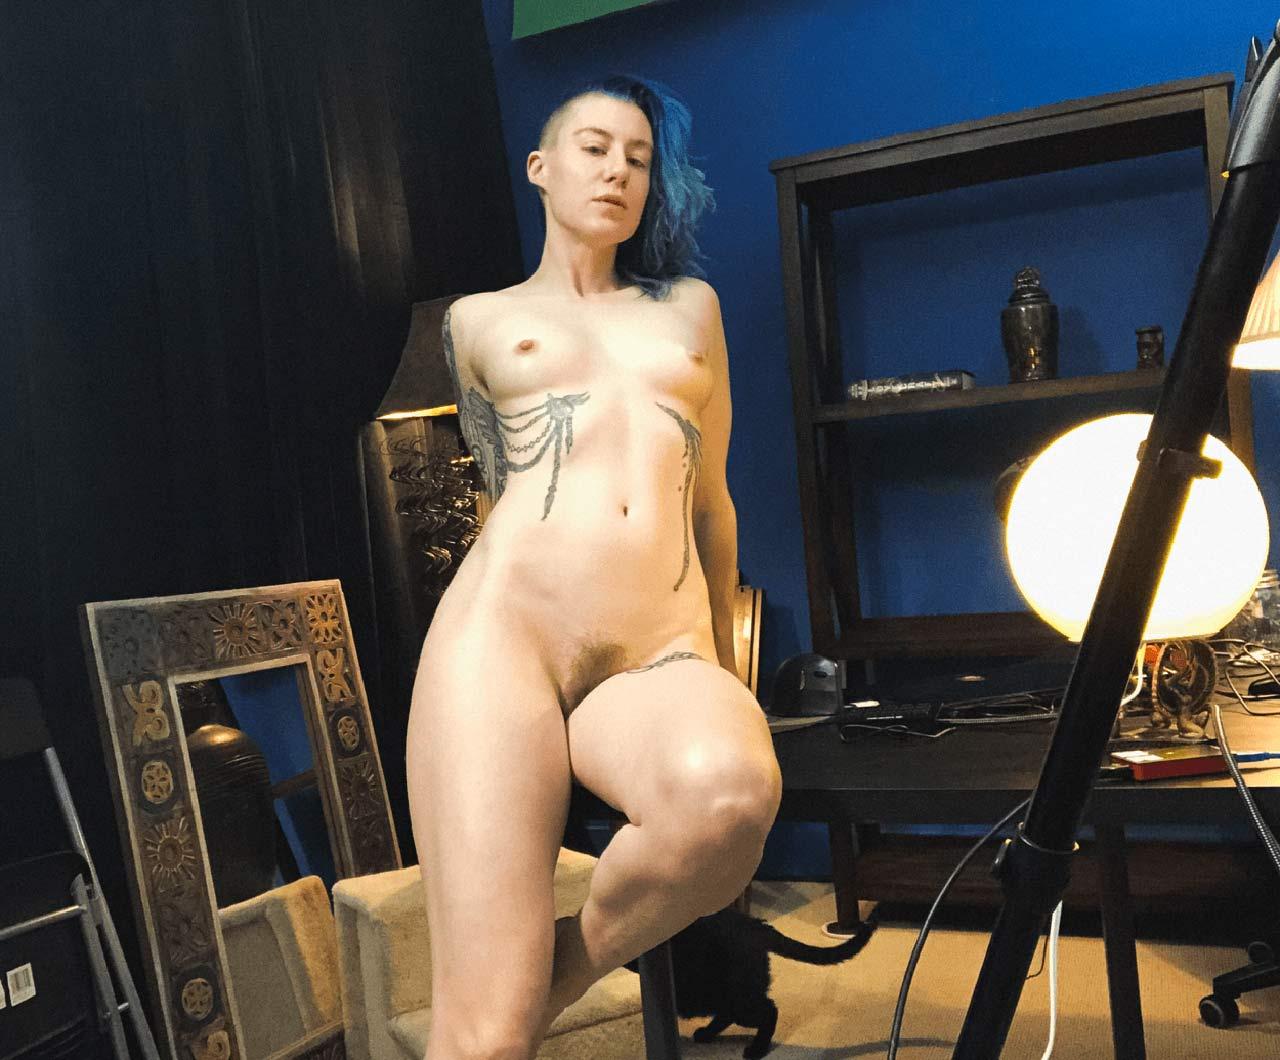 Comicbookgirl19 nude